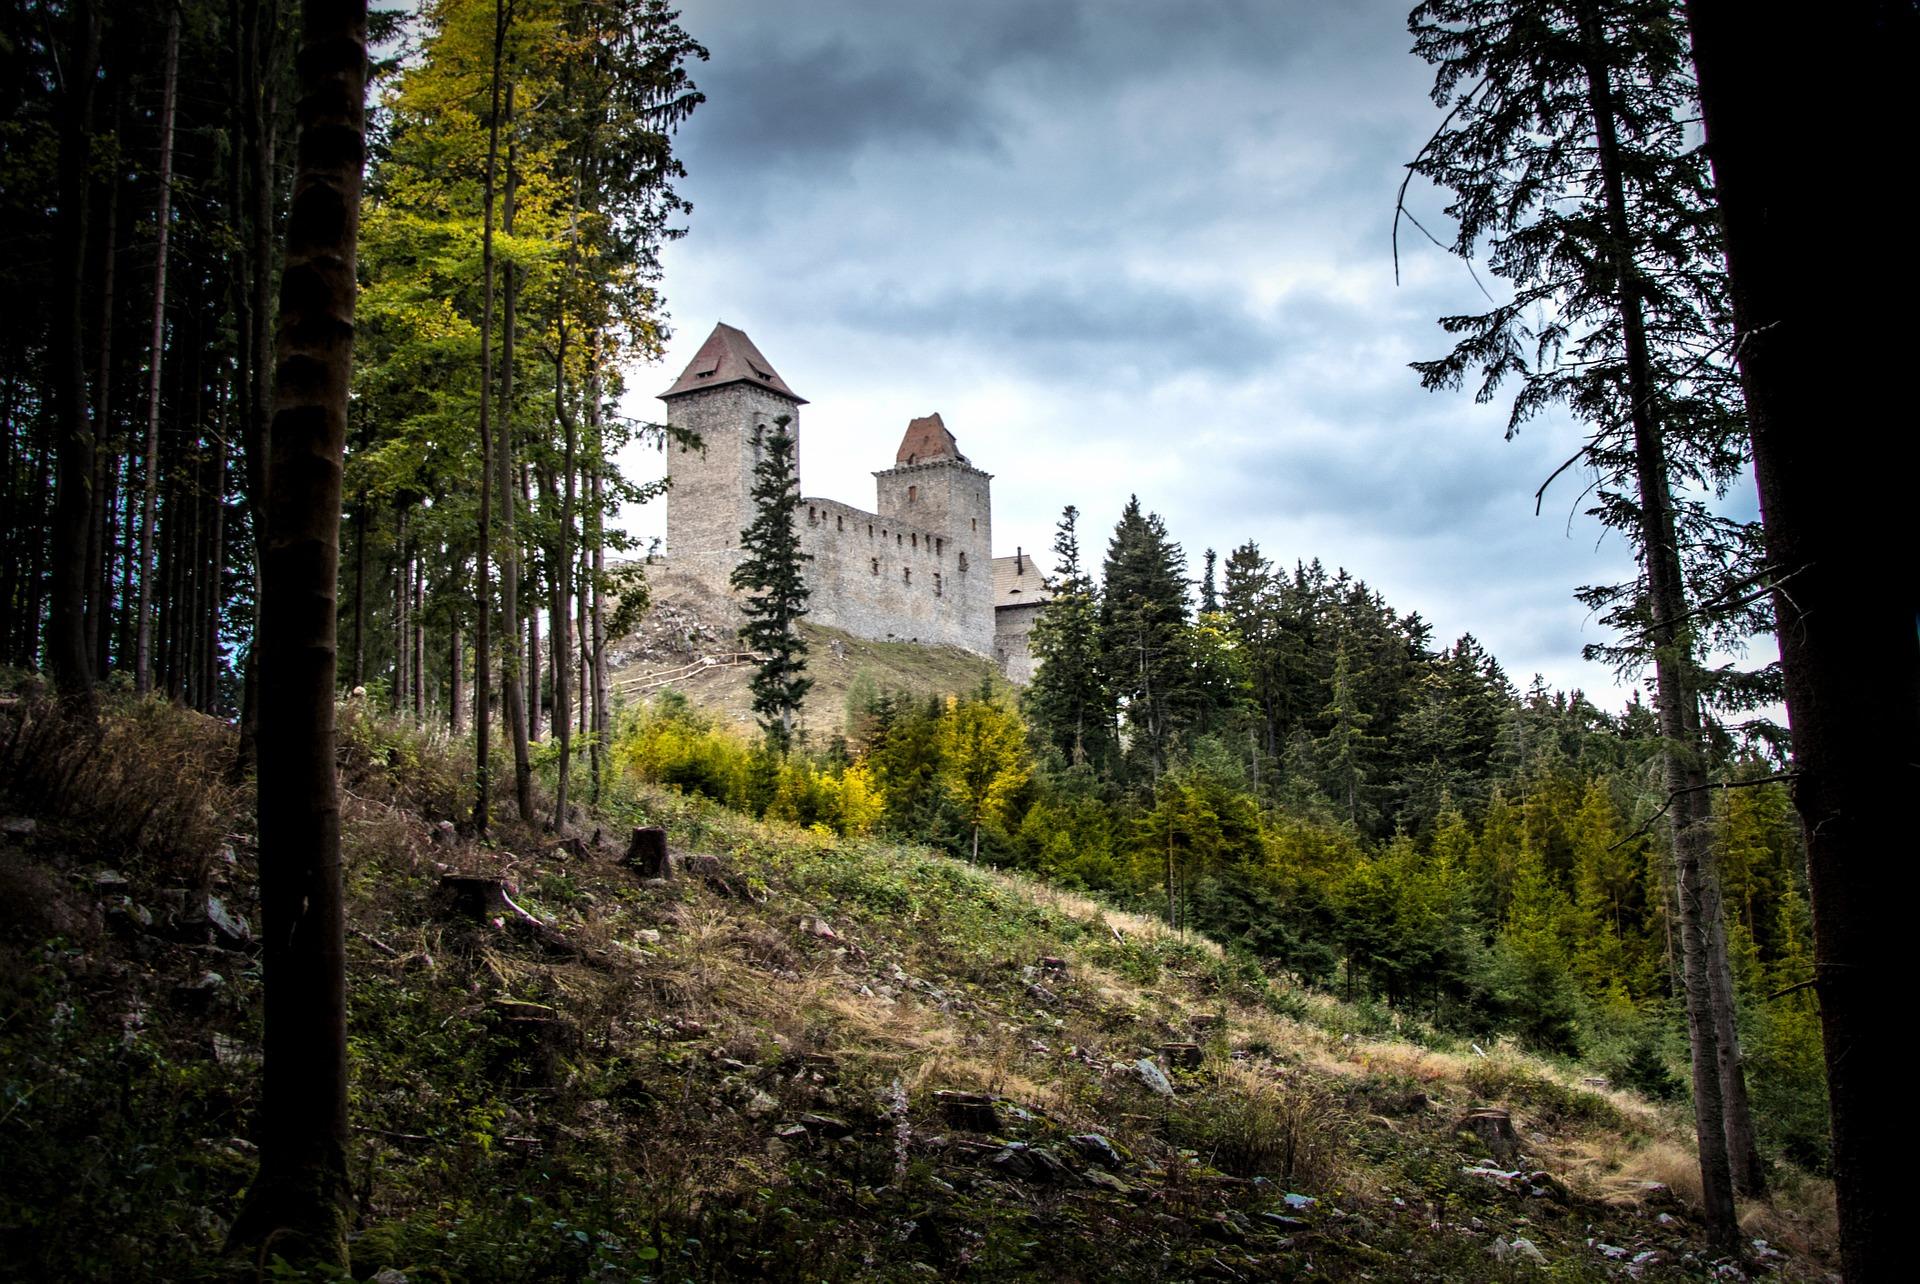 Замок Кашперк (Kasperk)